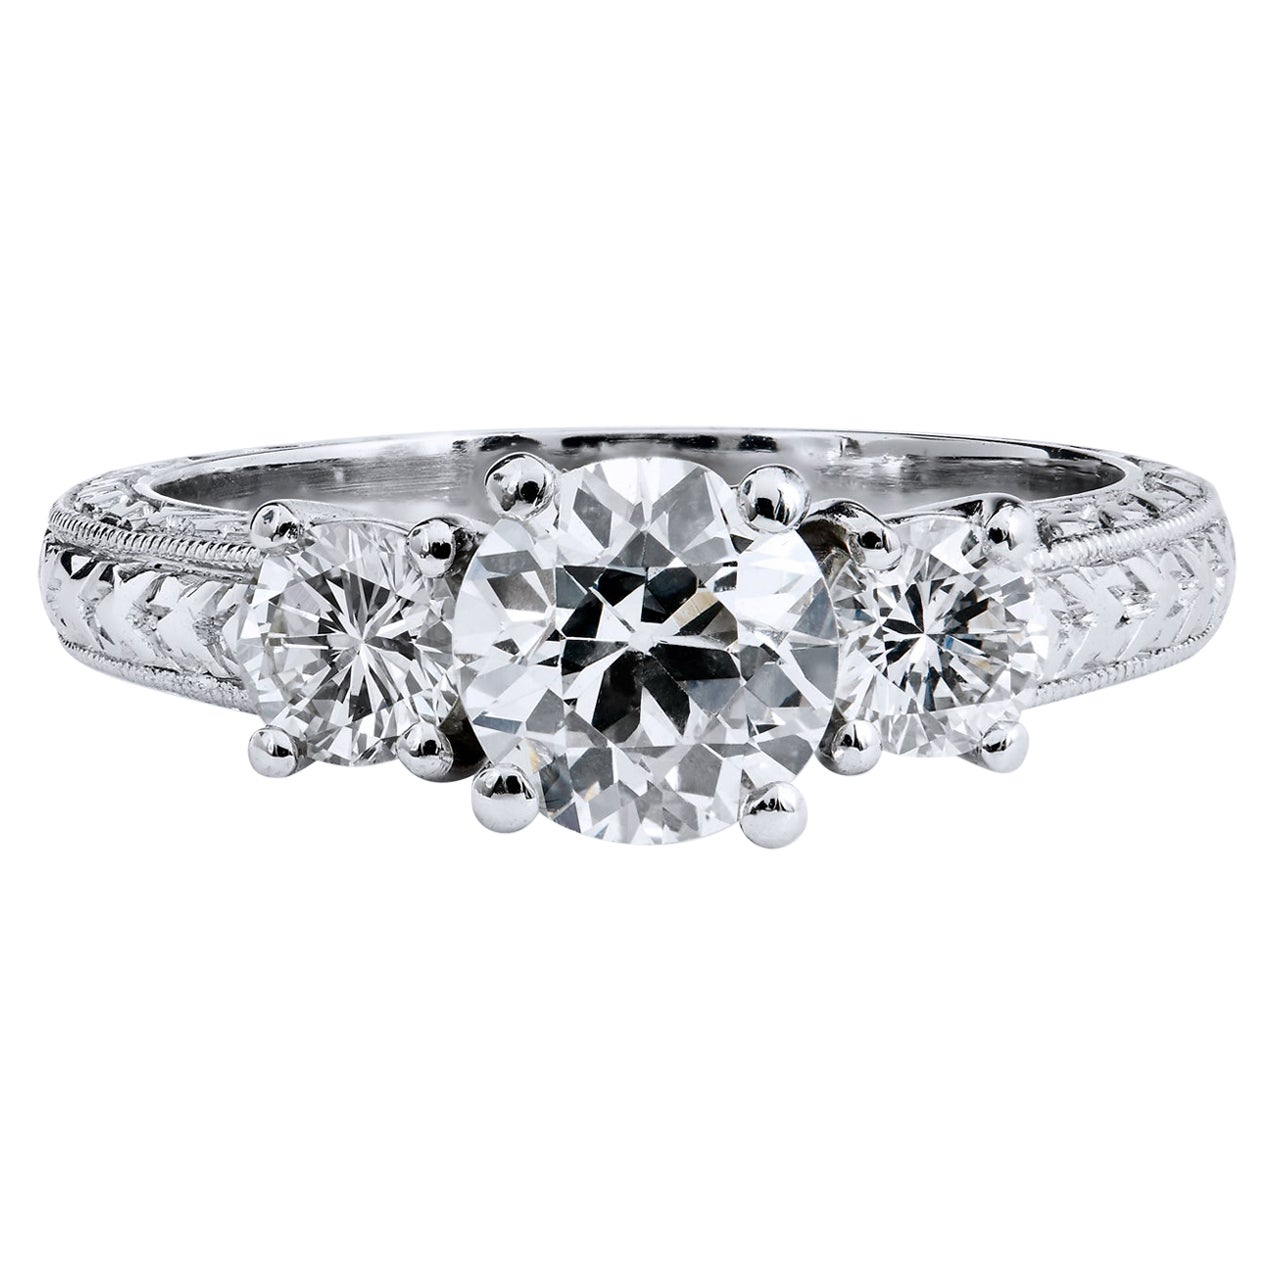 GIA Certified Three-Stone Old European Cut Diamond Engagement Ring